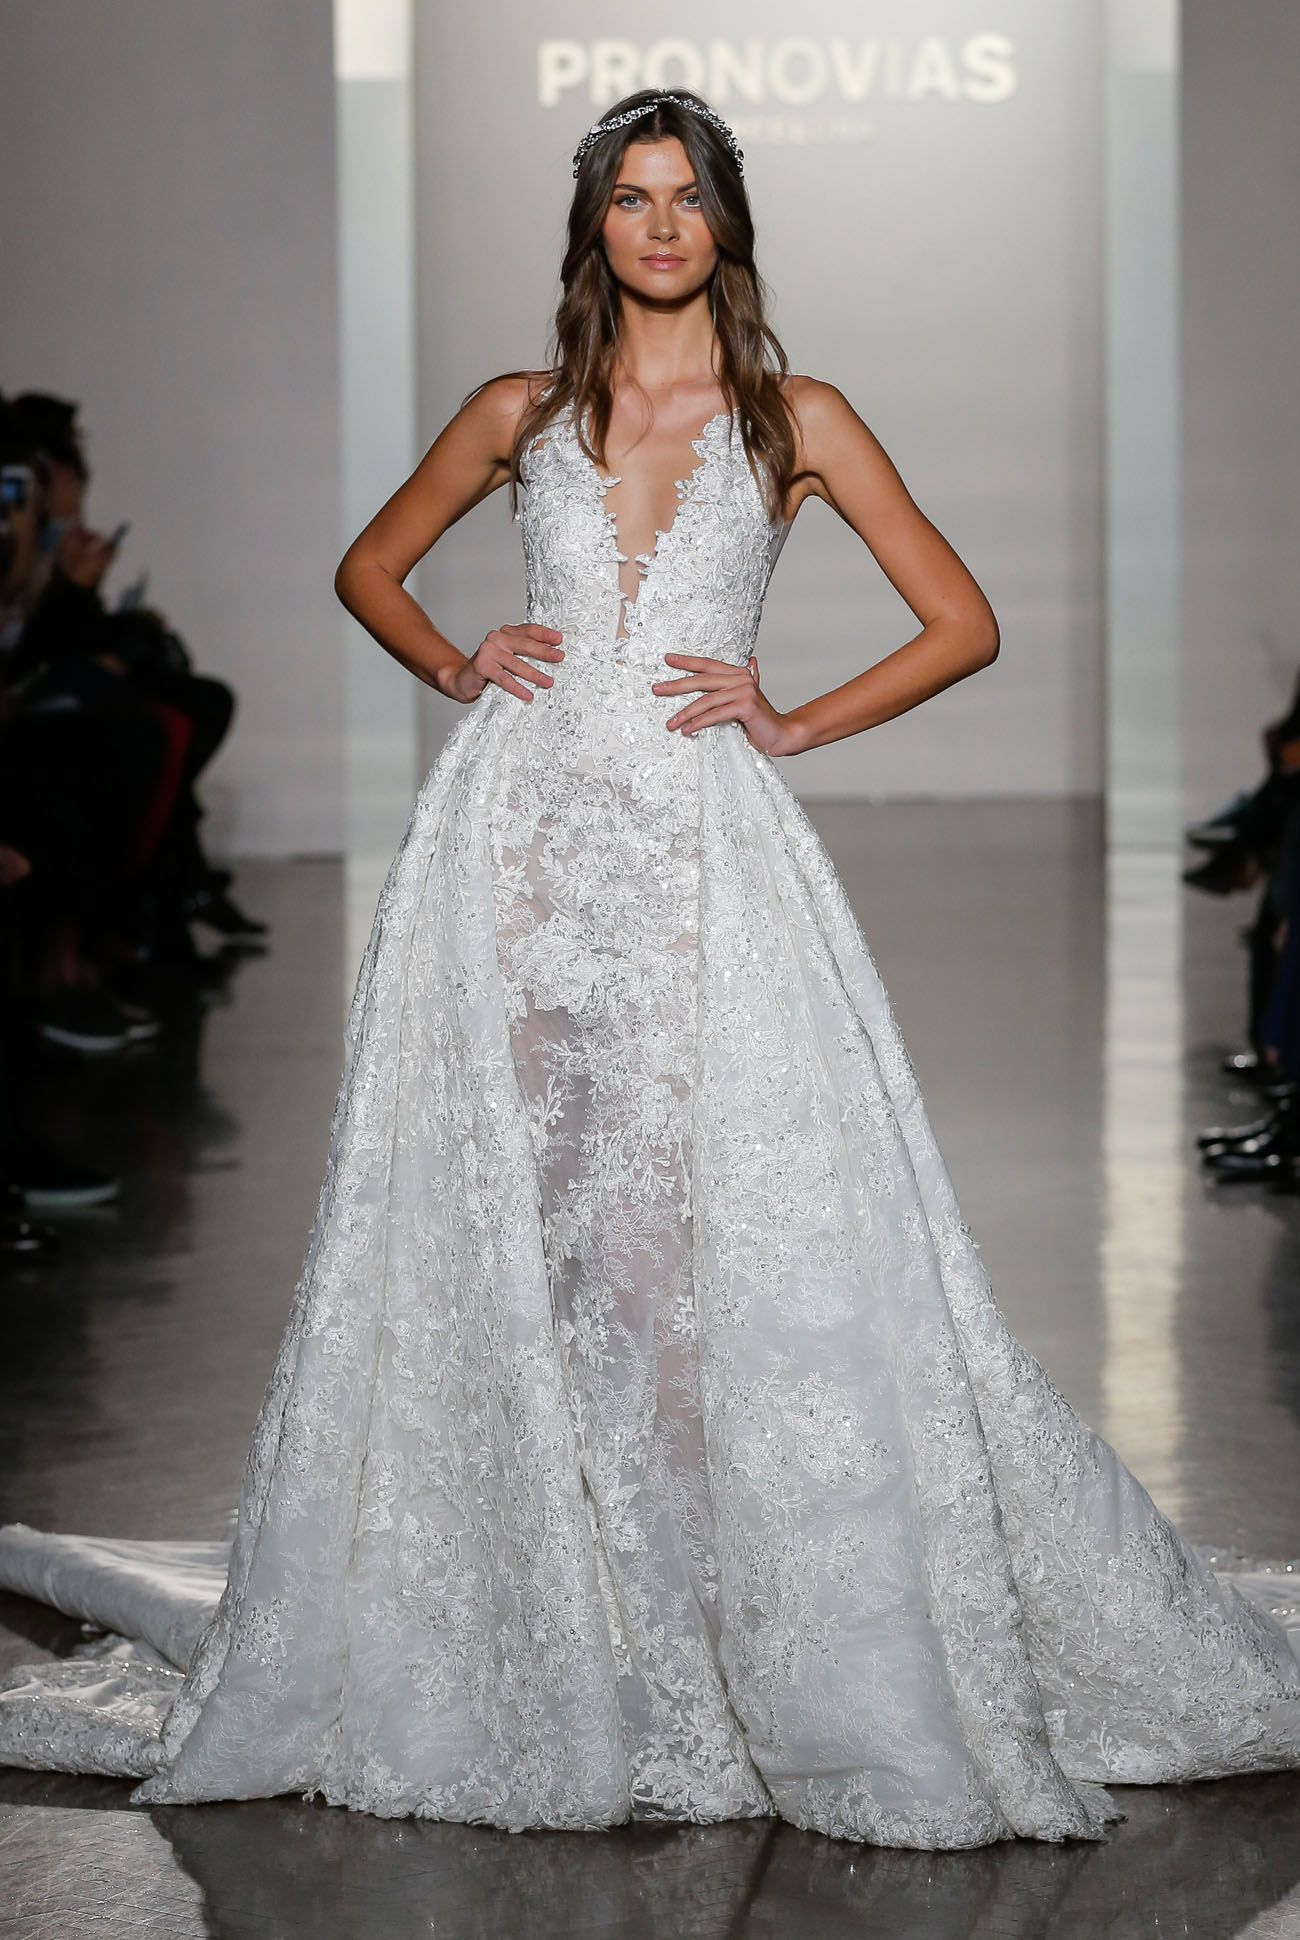 Bridal 2016 Market Pronovias This wedding NYC A deep line a with dress  Zw6xdRqH d97ba9b3ca8